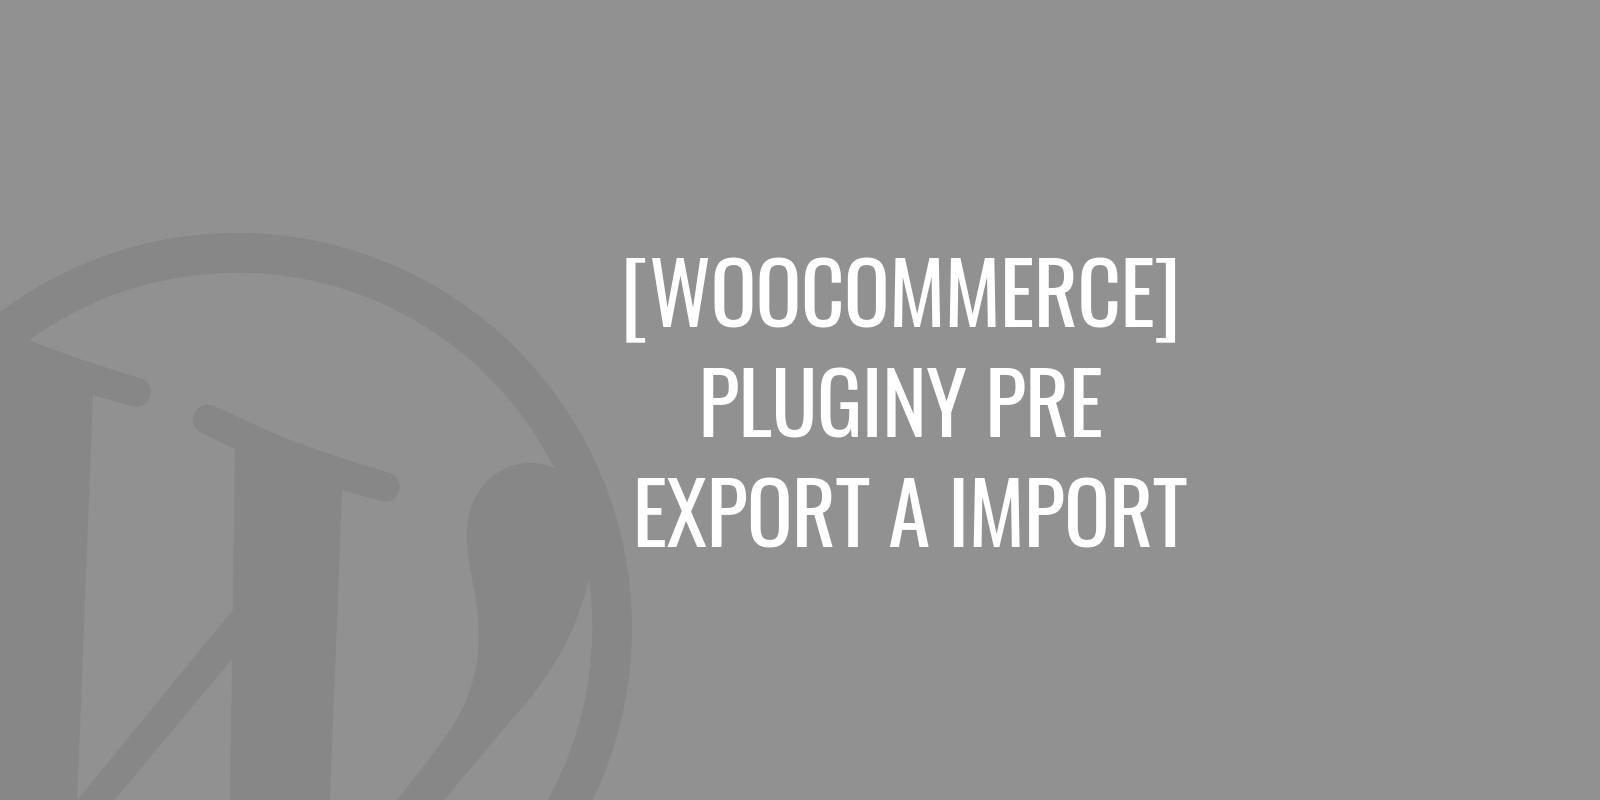 WooCommerce pluginy pre export a import